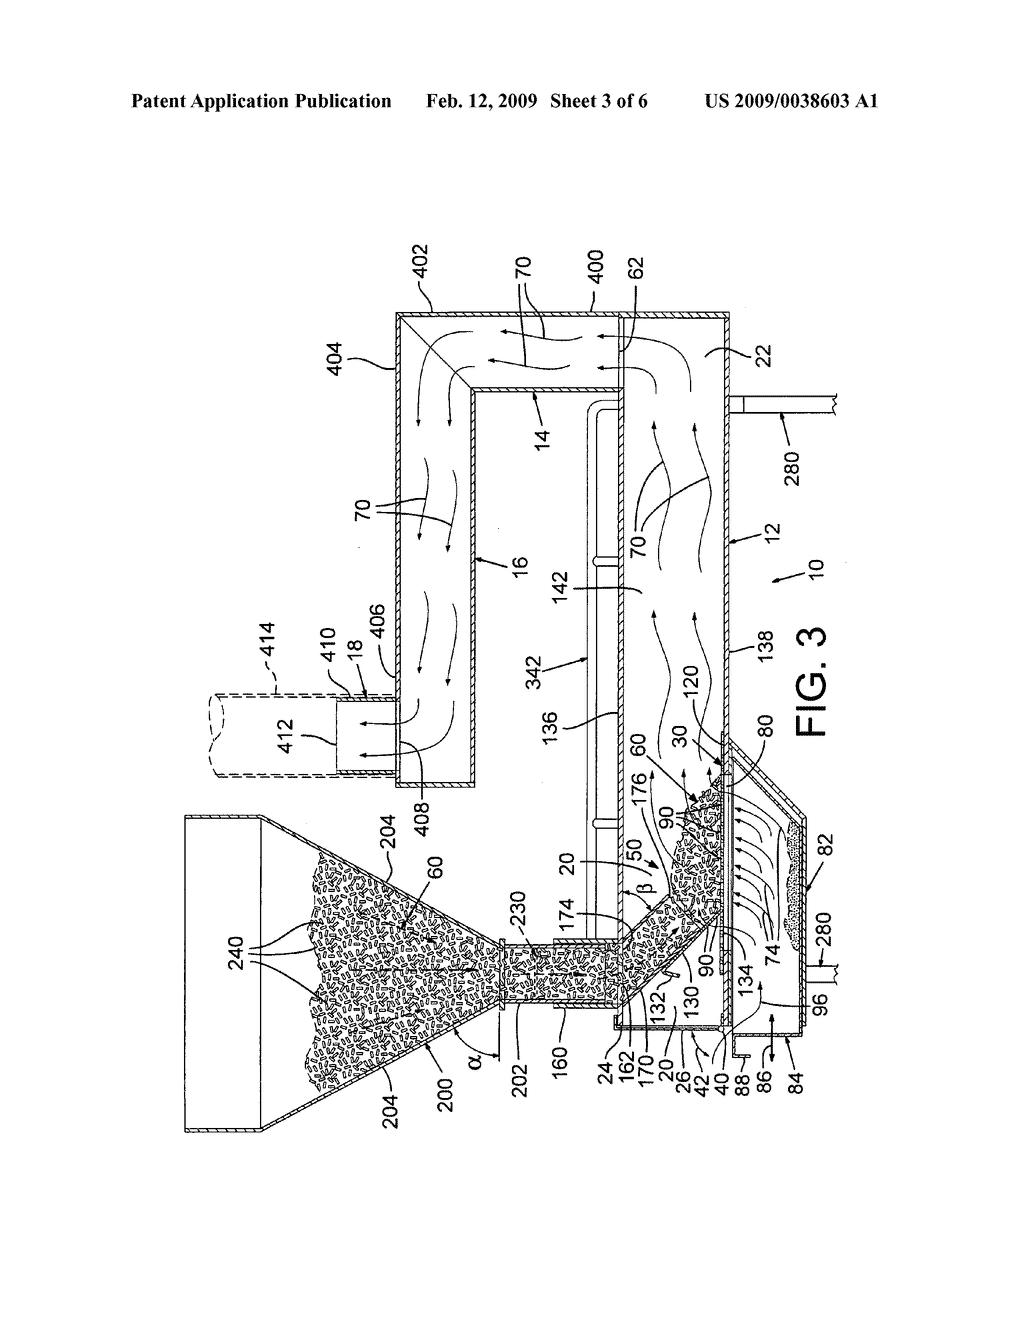 Diy Pellet Stove Diagram Trusted Wiring Diagrams Buck Enthusiast U2022 Thermostat